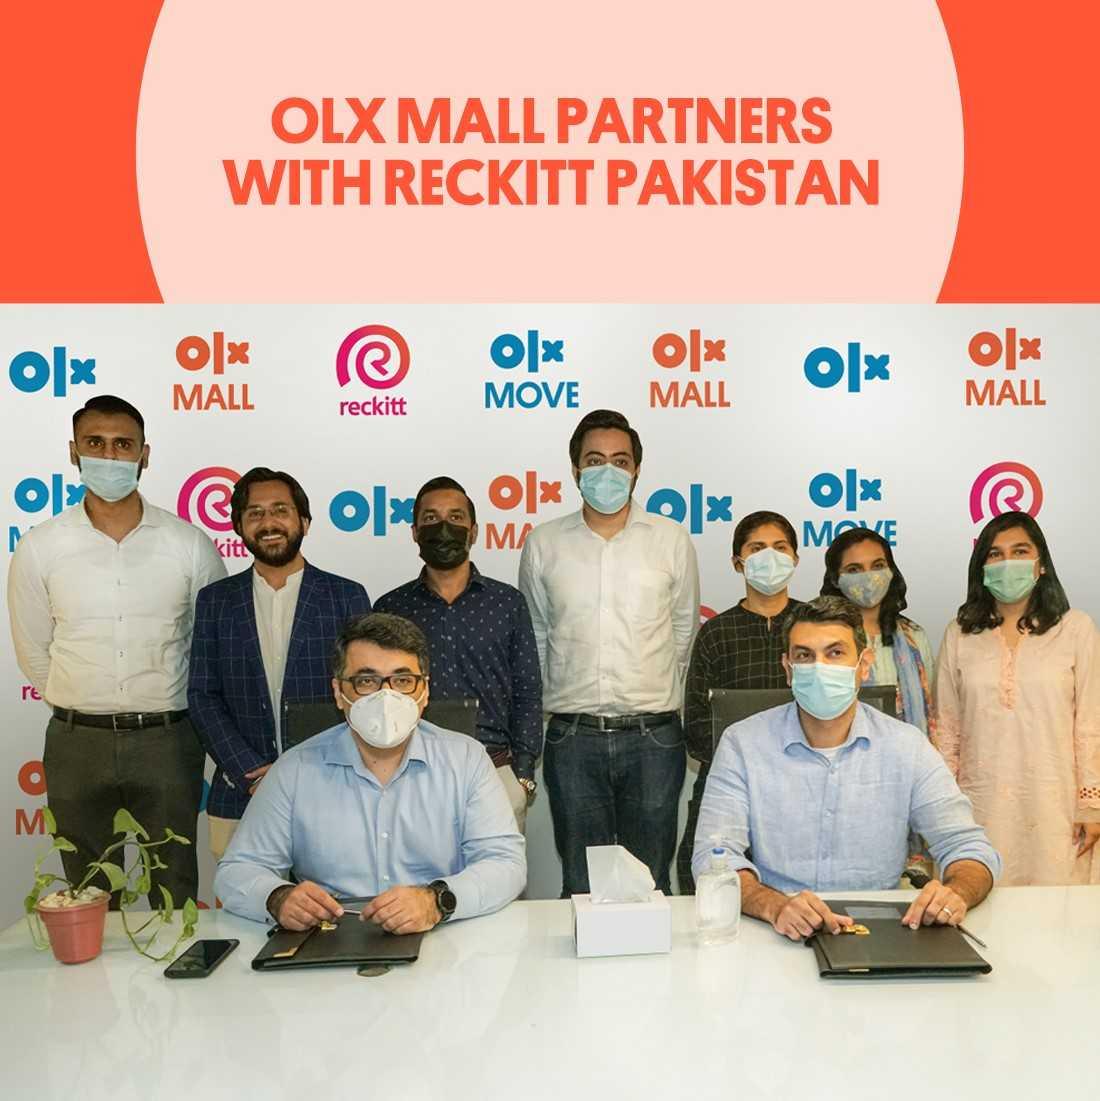 OLX Mall Partners with Reckitt Pakistan